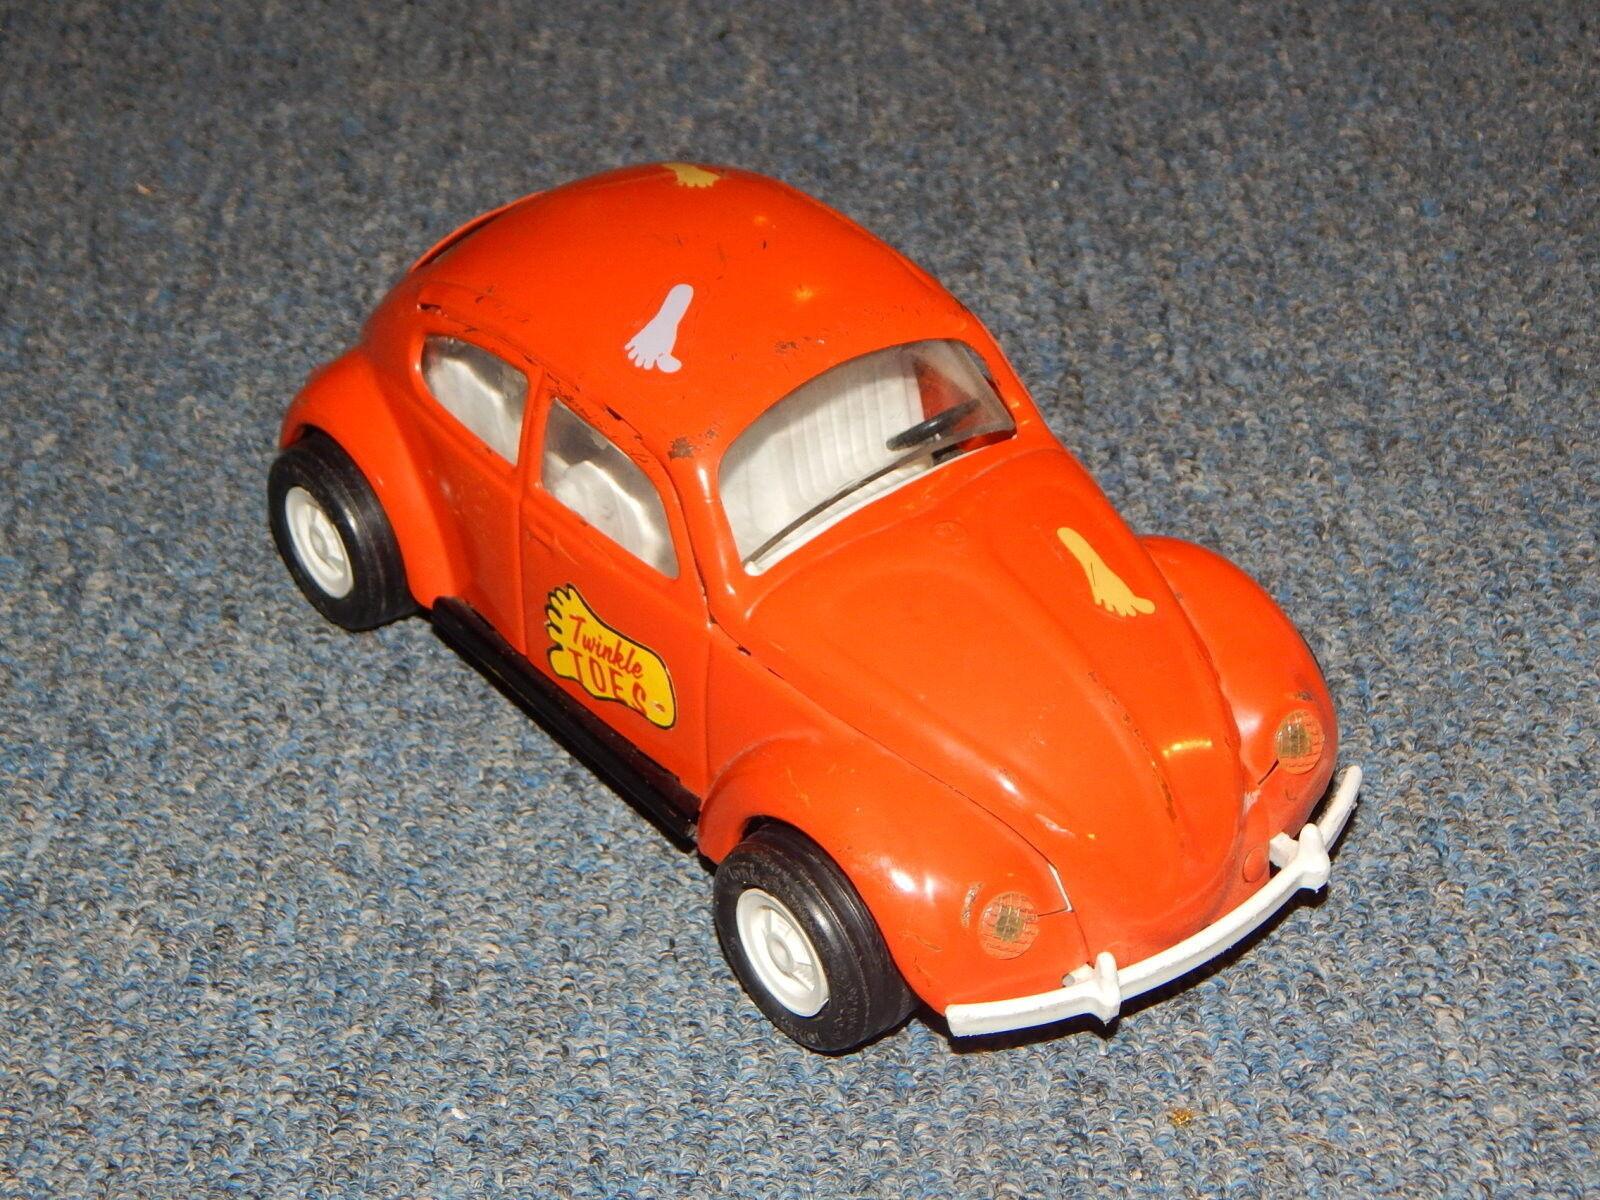 Vintage Tonka Chapa De Acero Negro Volkswagon  52680 Twinkle Toes R19443